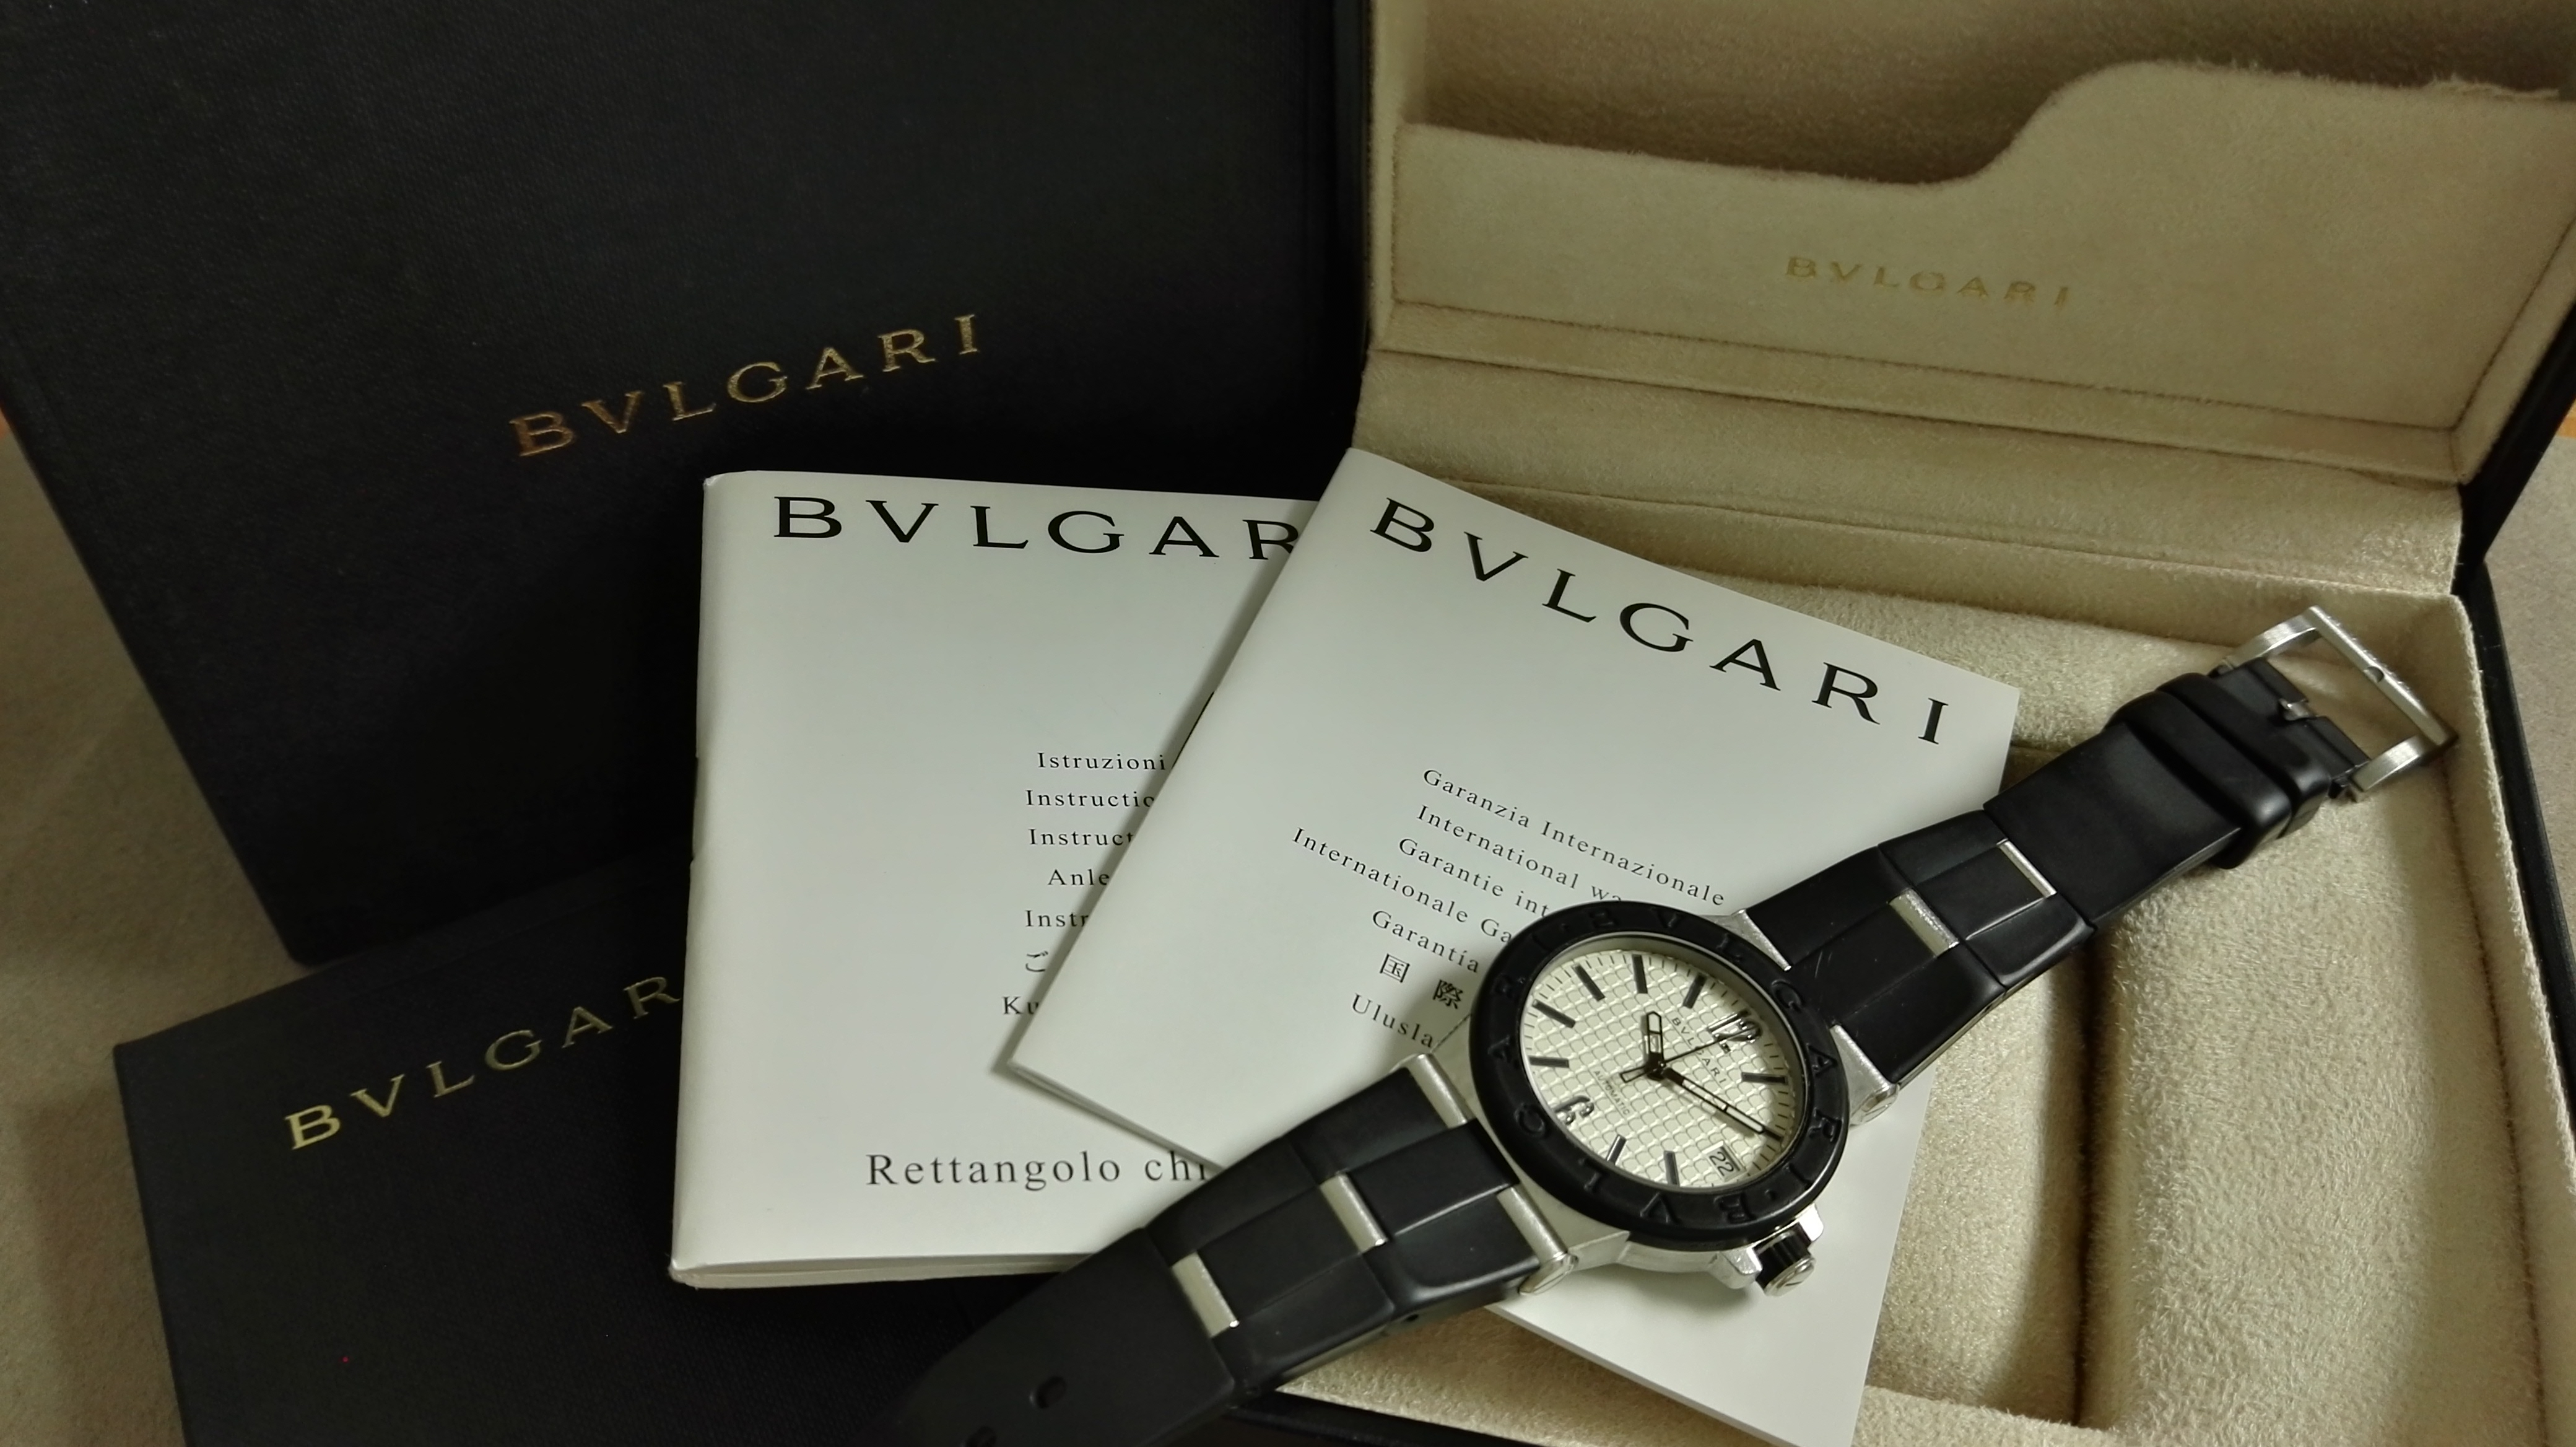 Bulgari Diagono Diagono DG 35 SV STAINLESS STEEL AUTOMATIC DATE UNISEX WATCH | San Giorgio a Cremano